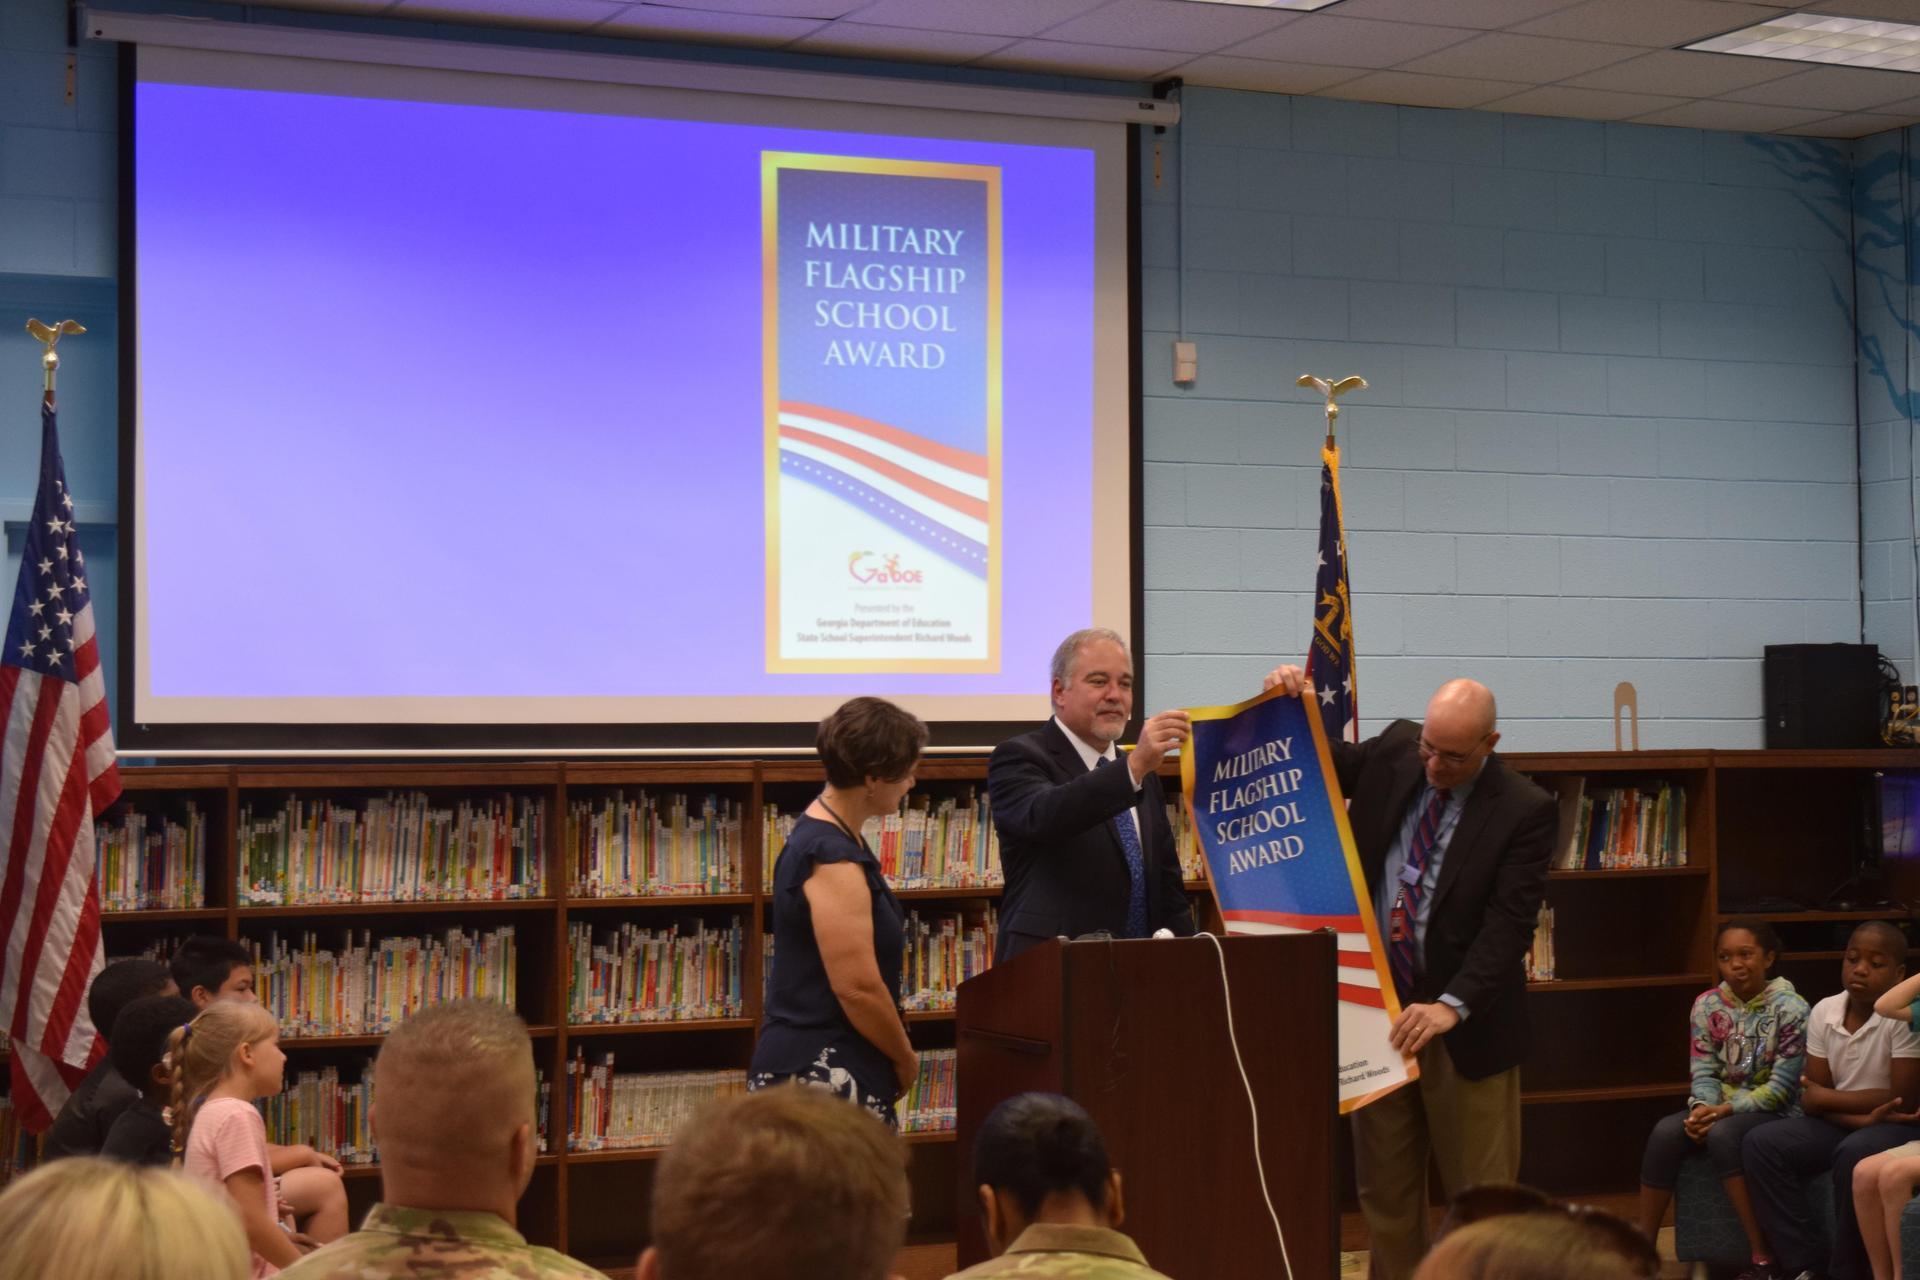 State Superintendent Richard Woods unfurls Military Flagship Banner award